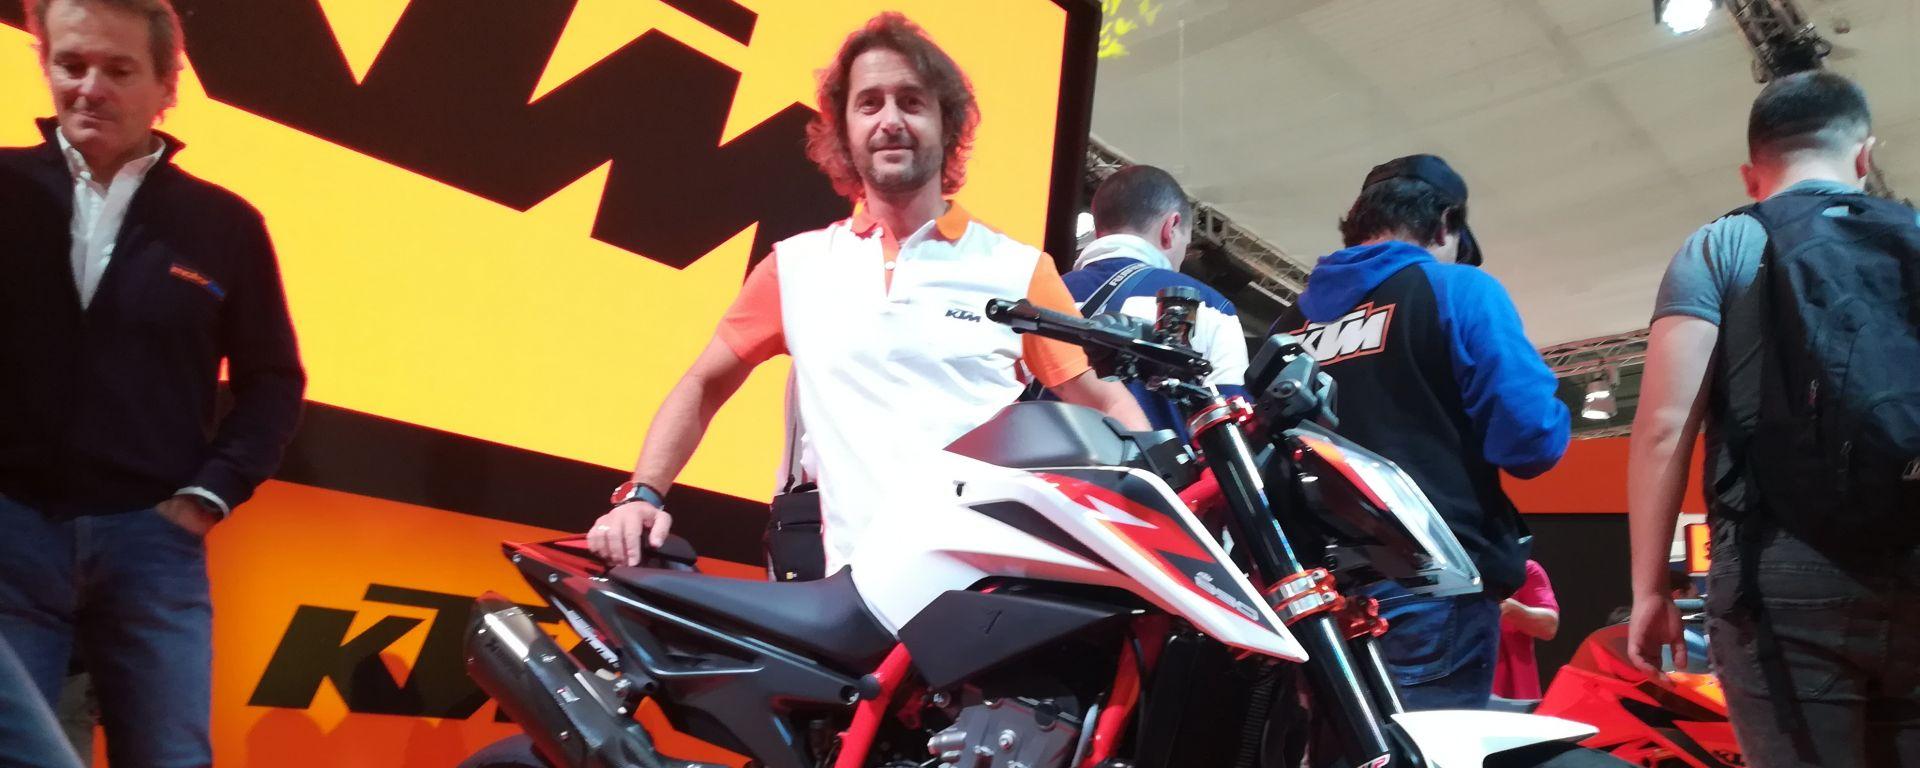 Paolo Fabiano KTM PR & MARKETING MANAGER ITALY